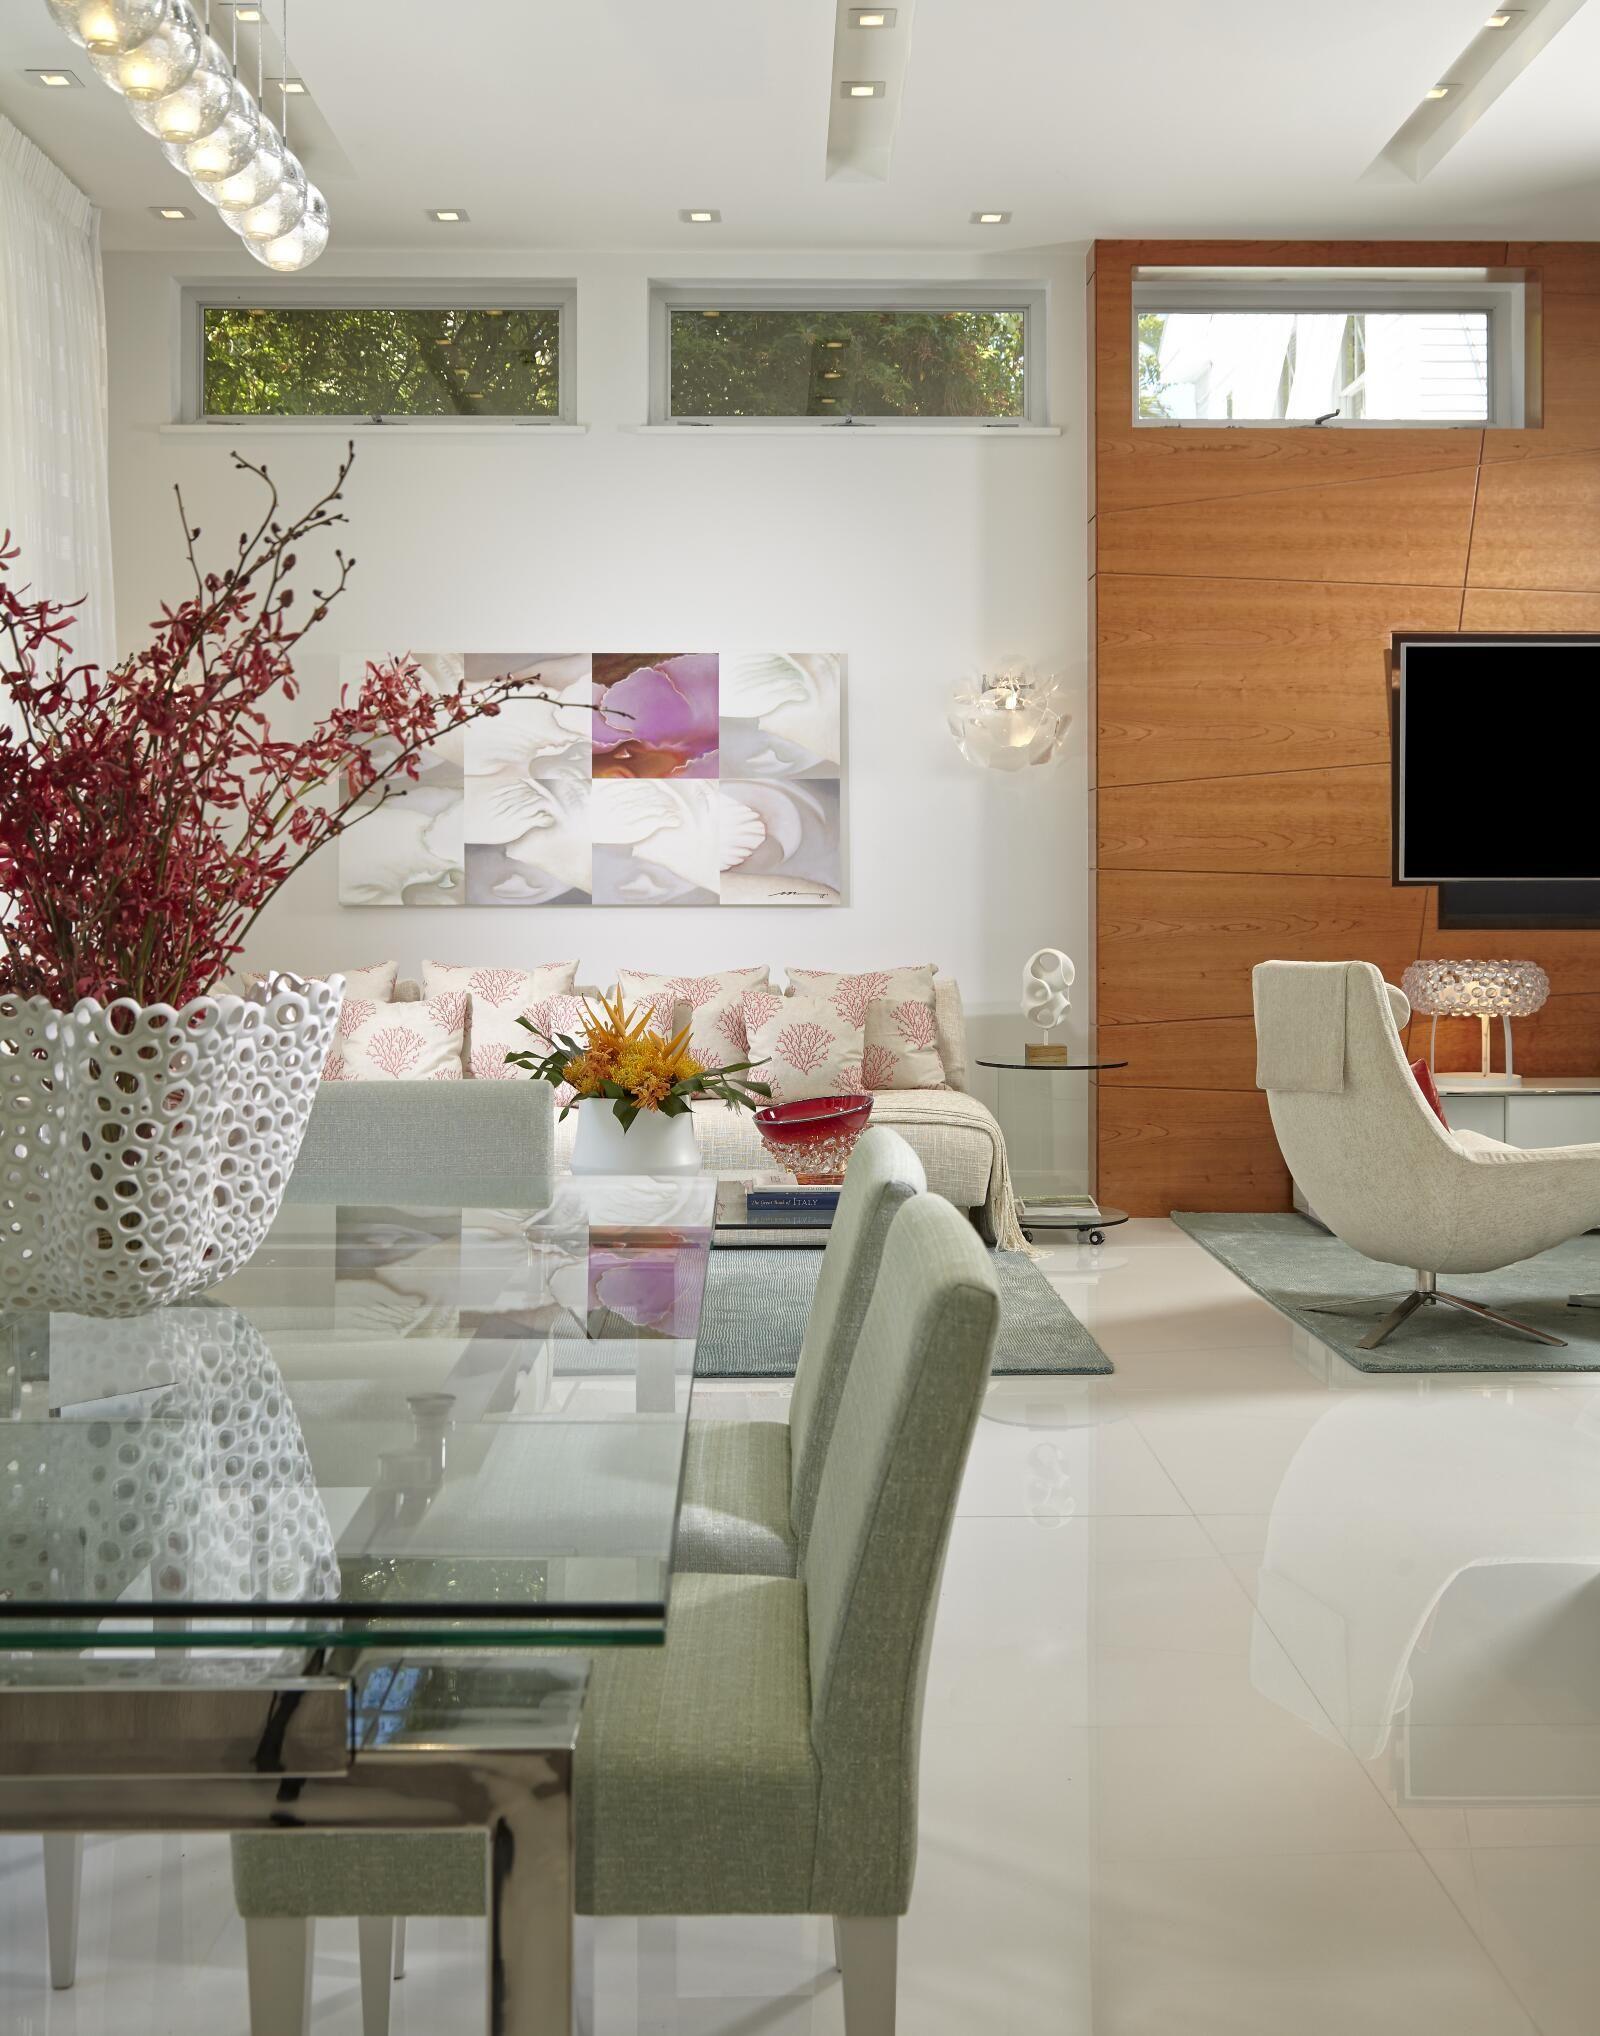 It s Design December in Miami Florida so BRABBU gives you Top